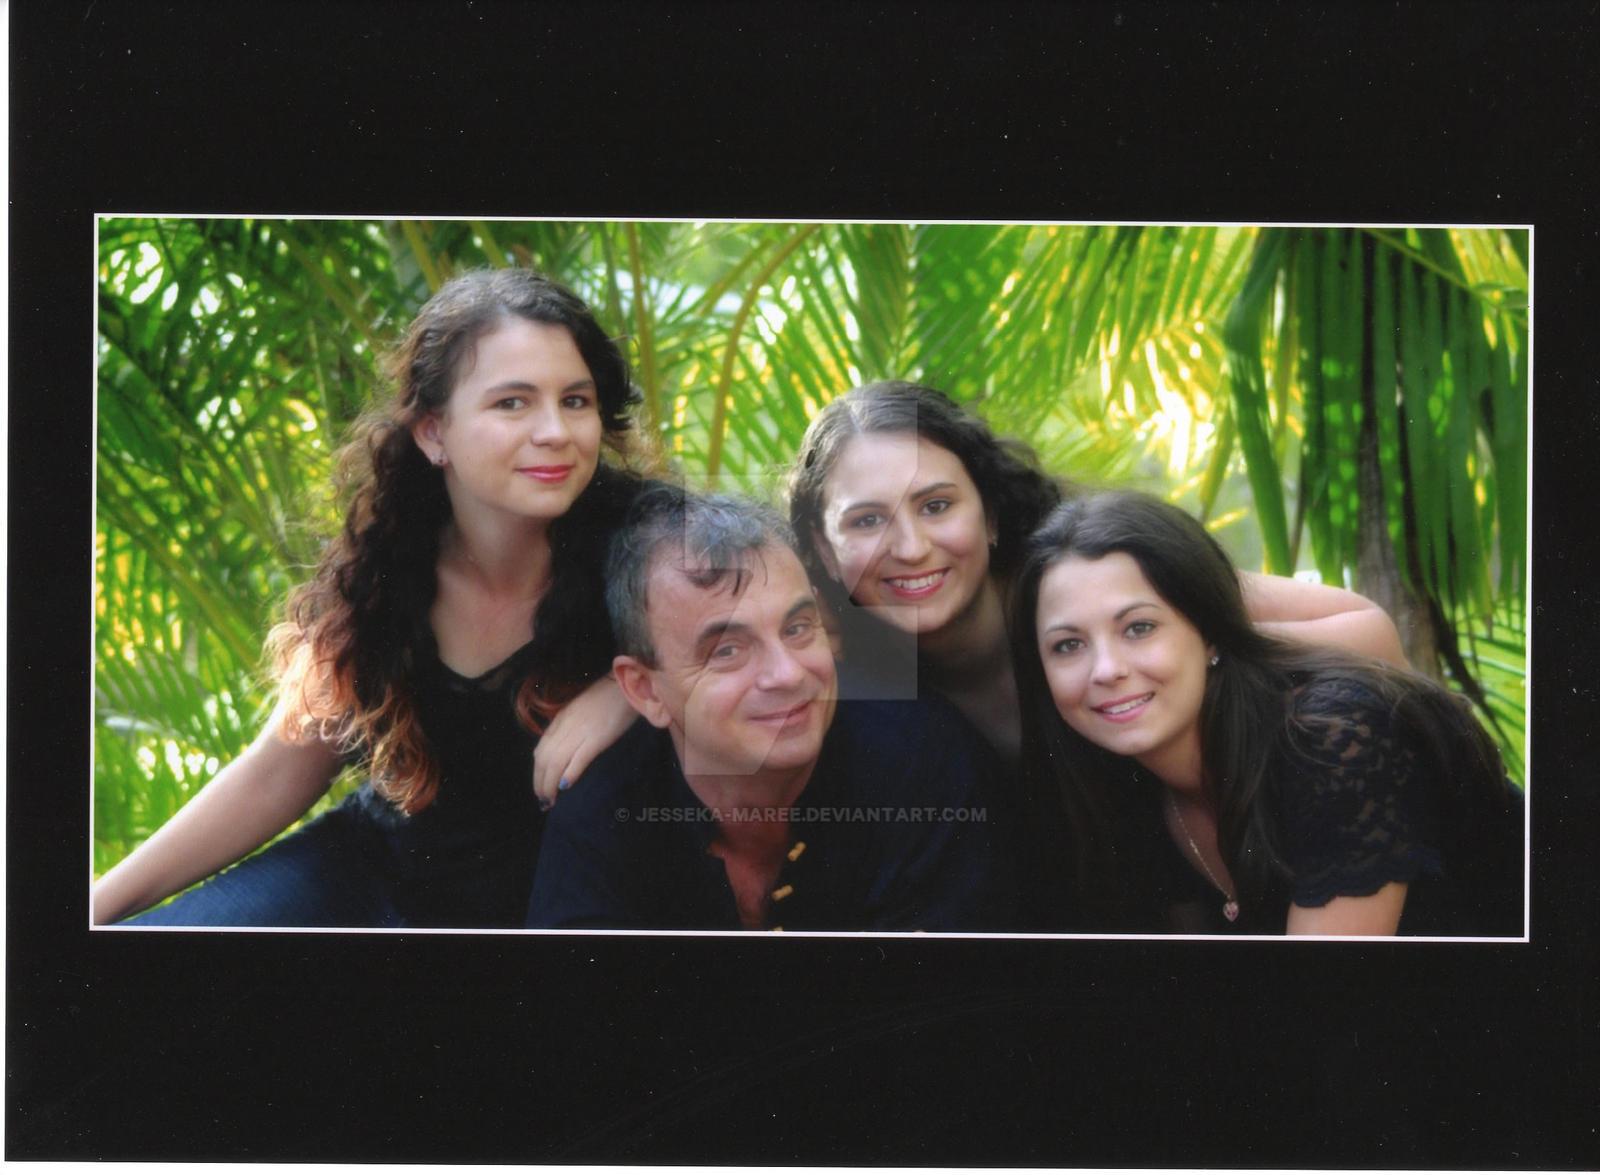 My family by Jesseka-maree